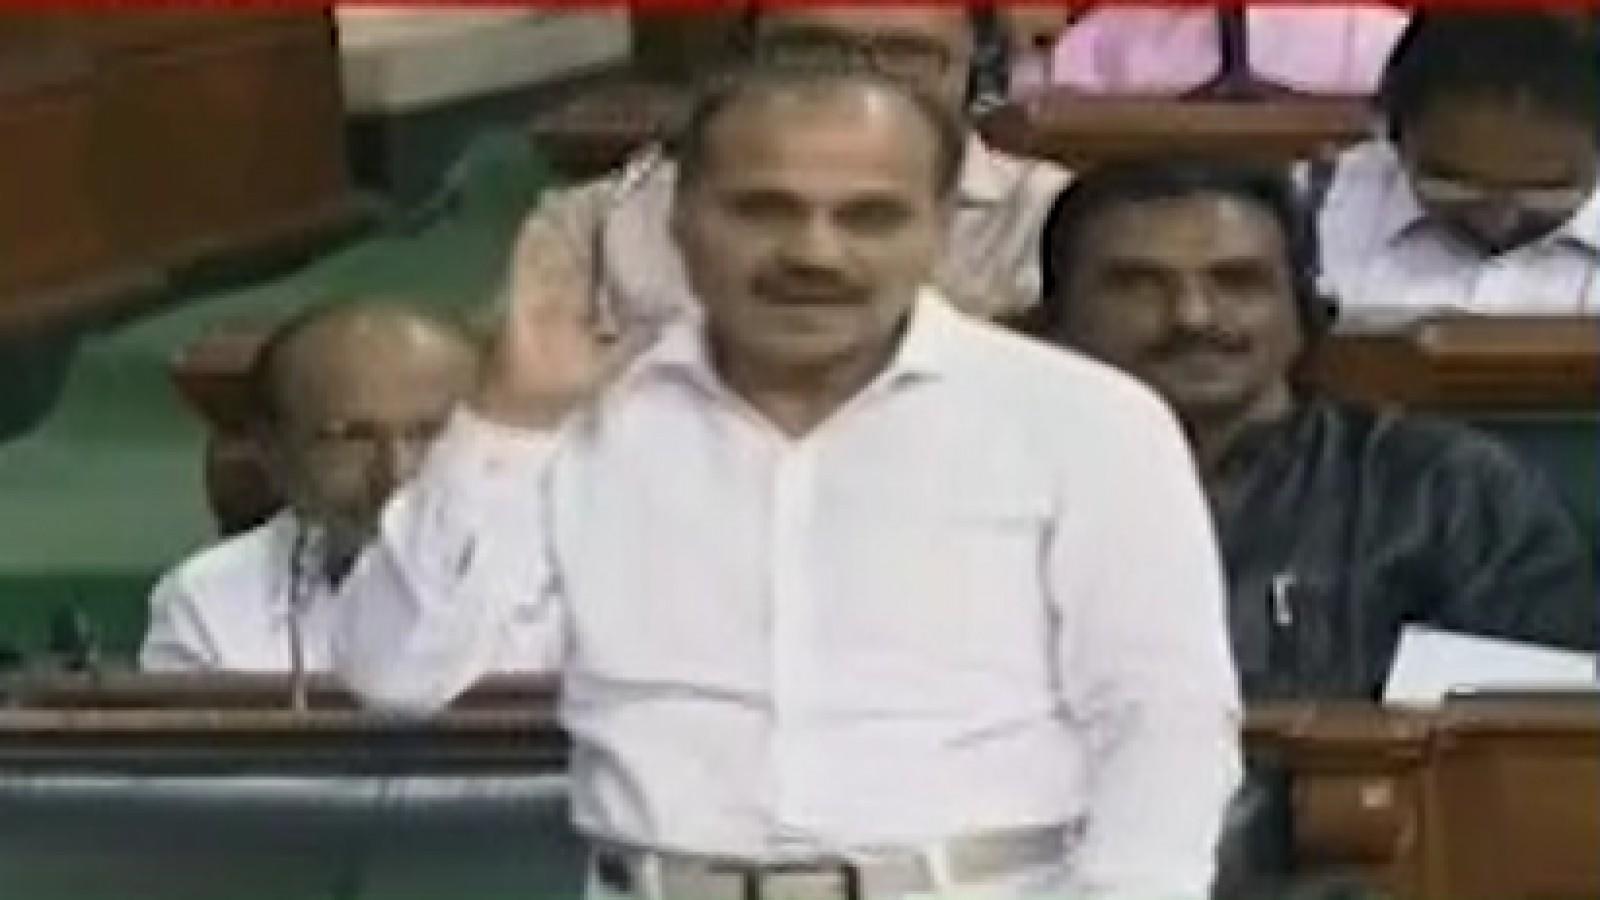 adhir-ranjan-chowdhury-blames-poor-hindi-for-gandi-naali-jibe-at-pm-modi